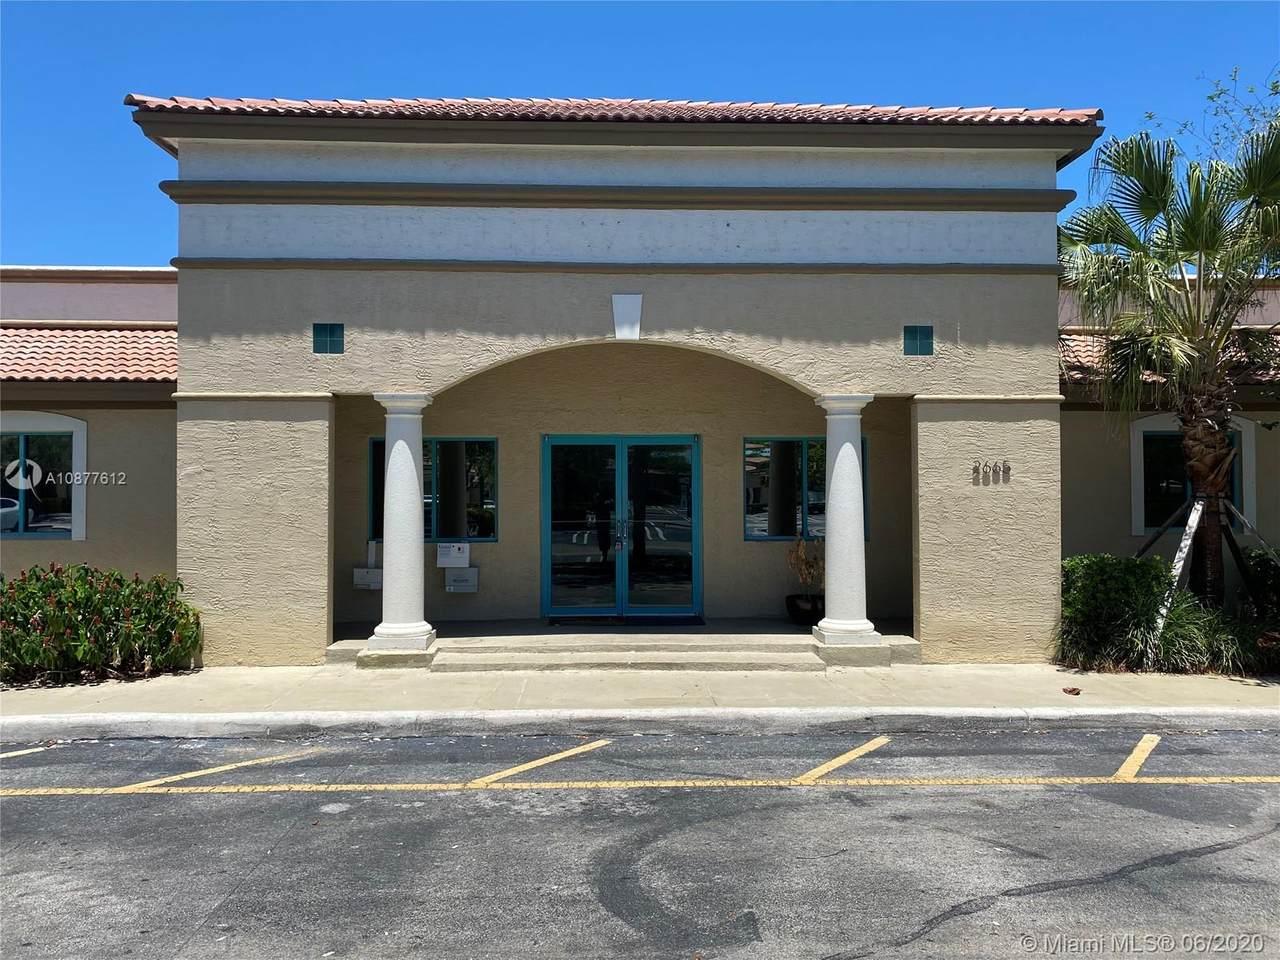 2665 Executive Park Dr - Photo 1